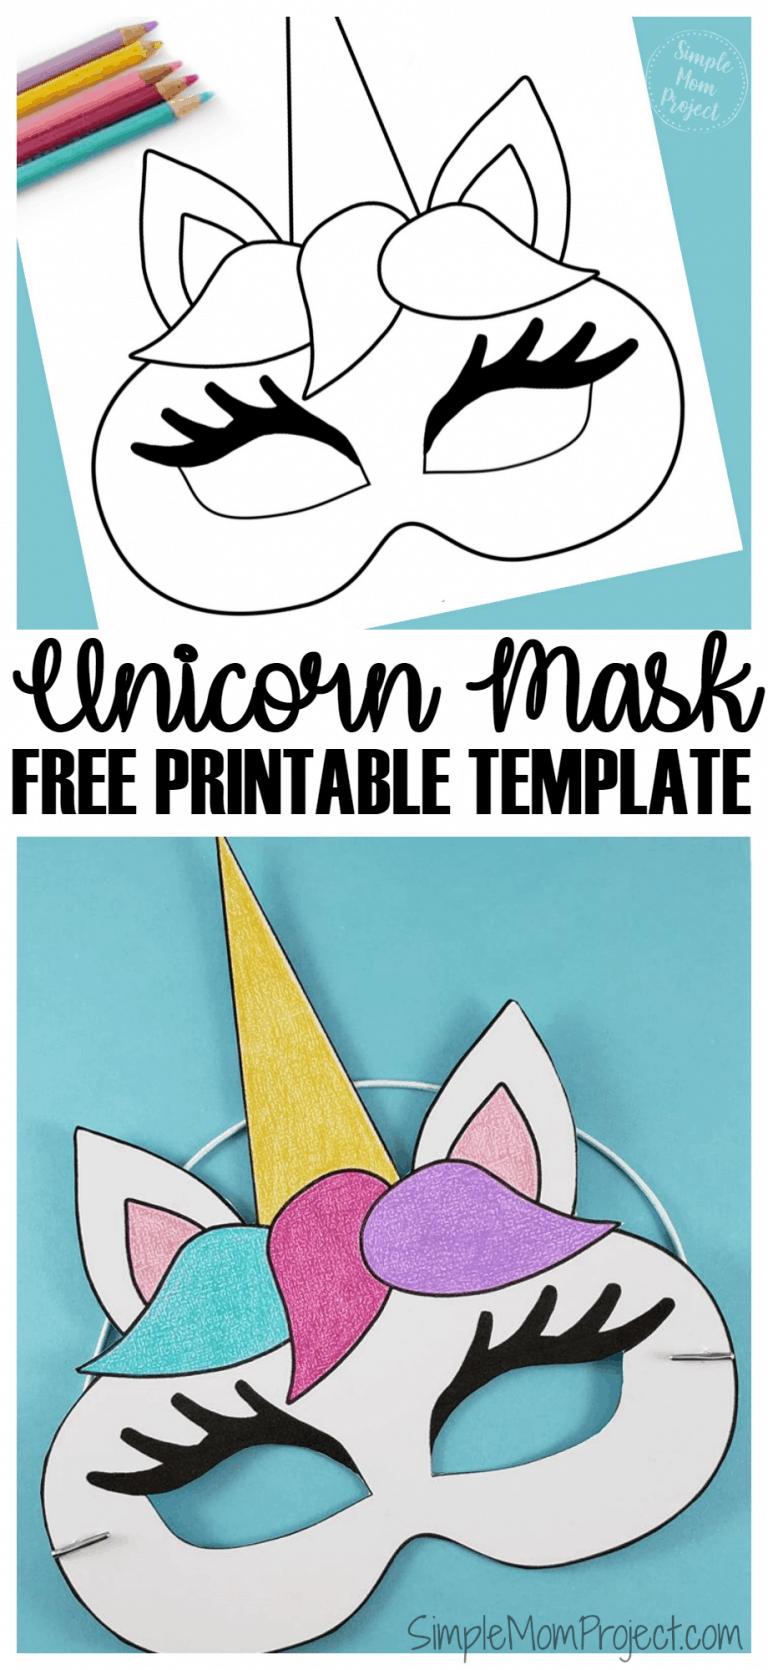 Unicorn Face Masks With Free Printable Templates - Simple Mom Project - Free Printable Unicorn Mask